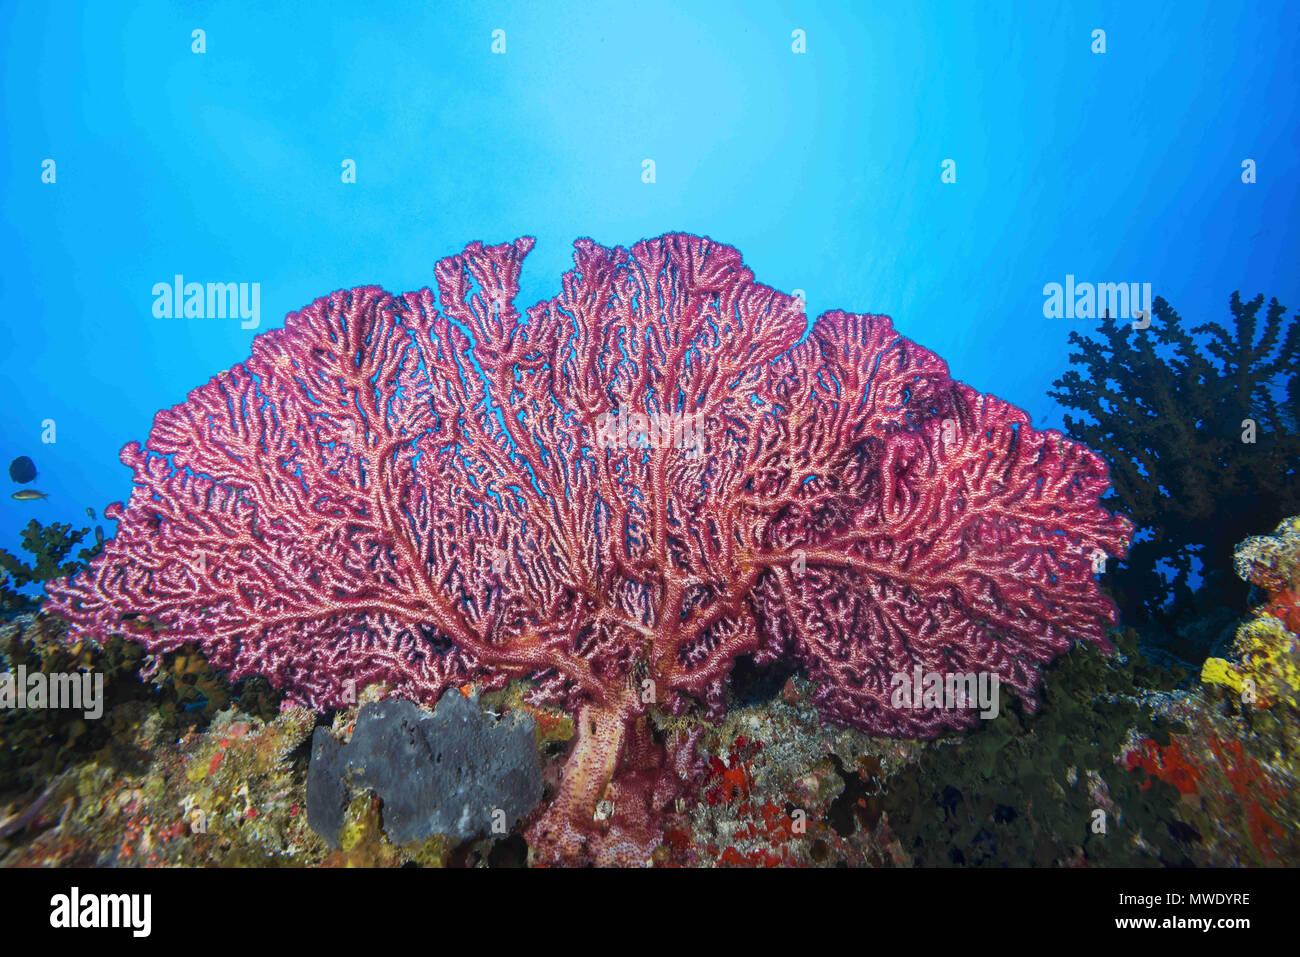 Indian Ocean, Maldives. 5th Apr, 2018. Cherry Blossom Coral or Godeffroy's Soft Coral Credit: Andrey Nekrasov/ZUMA Wire/ZUMAPRESS.com/Alamy Live News Stock Photo